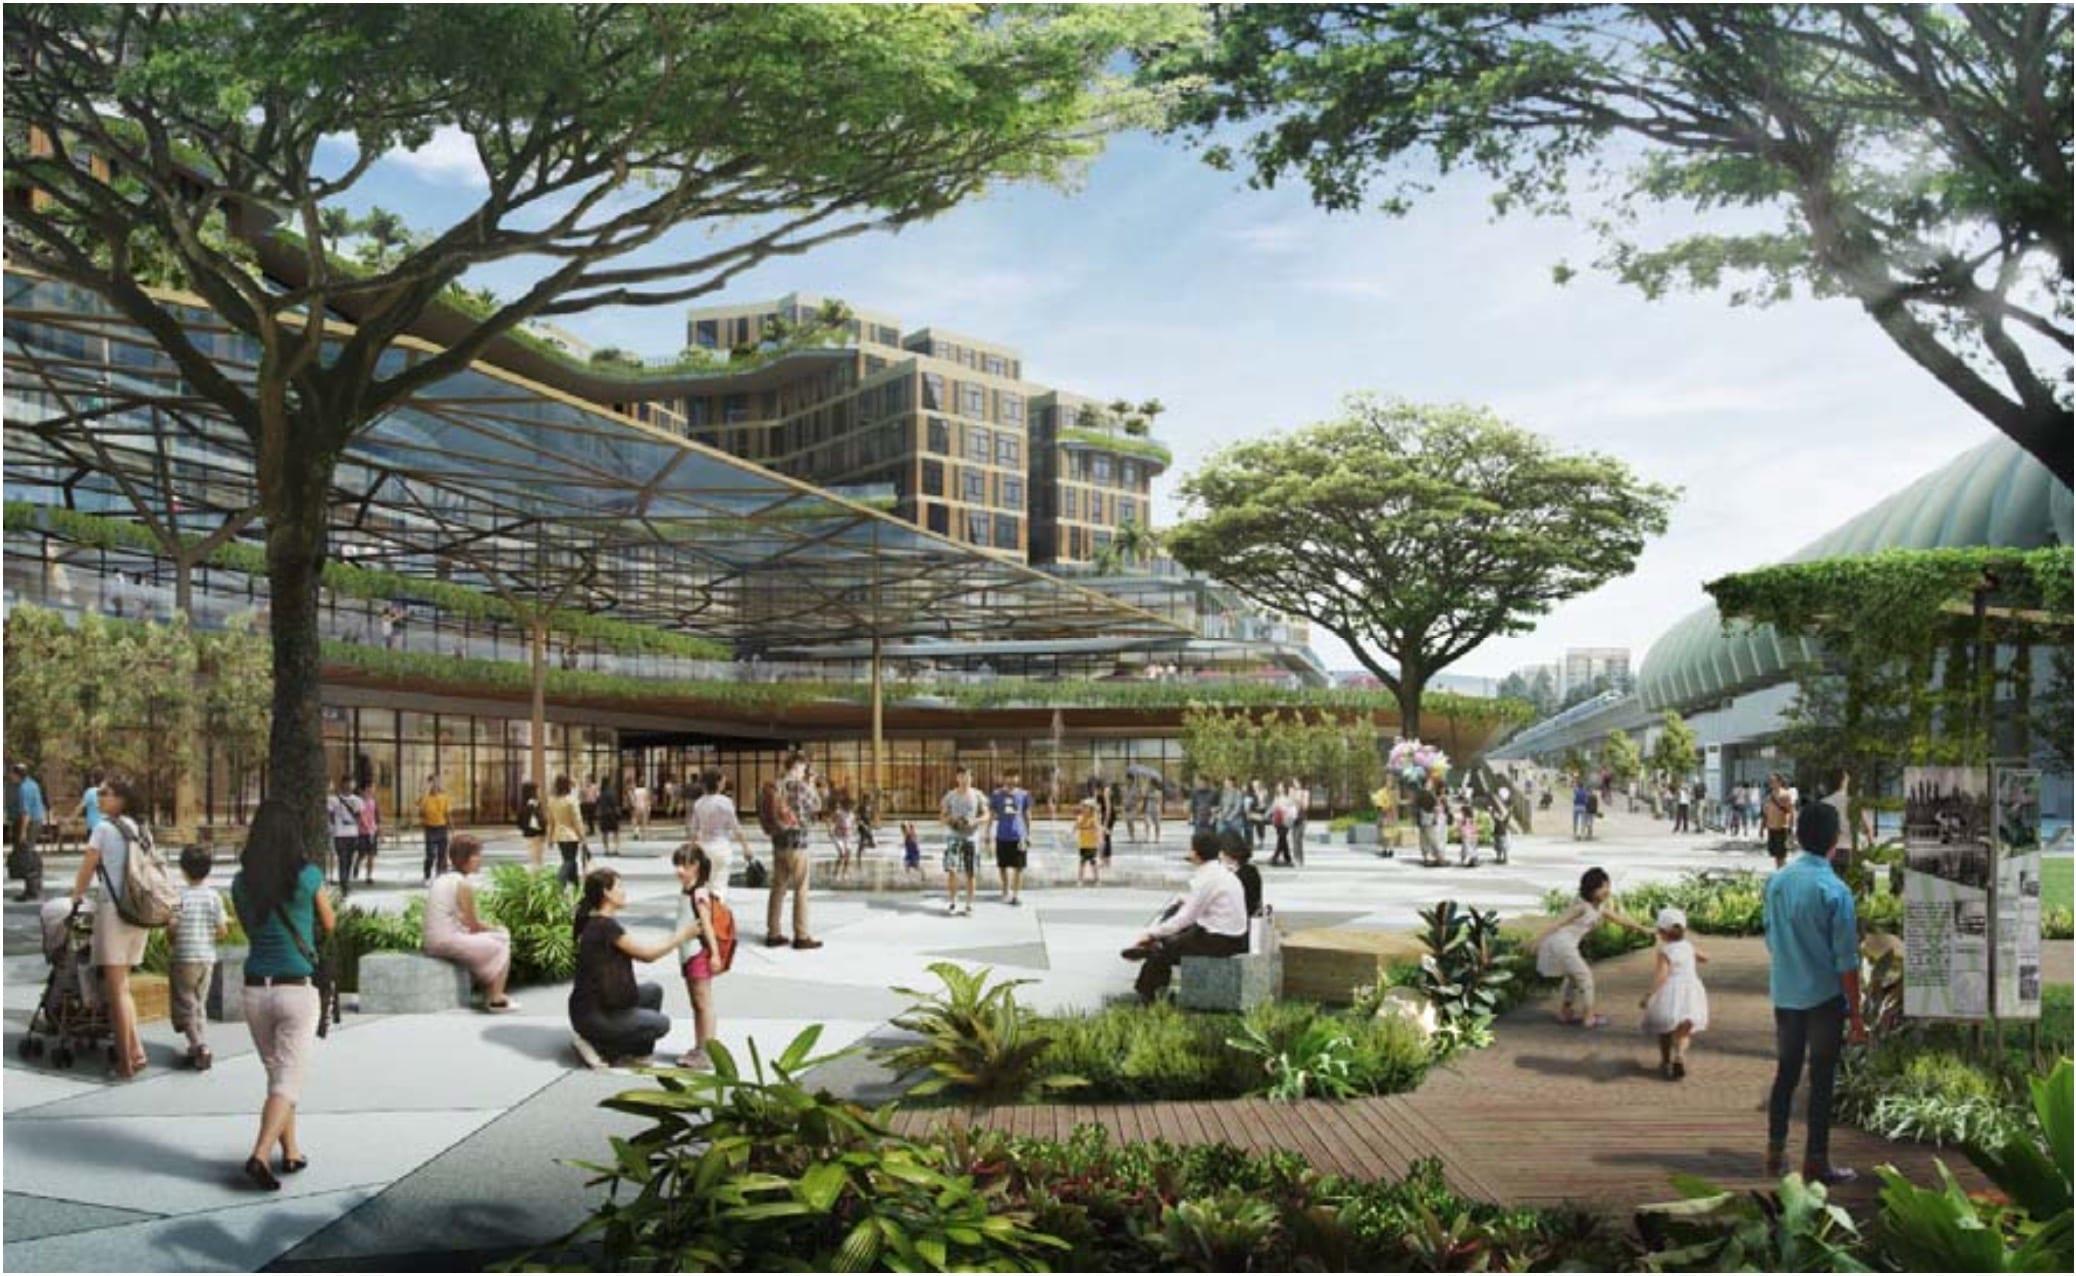 Pasir Ris Central Town Plaza